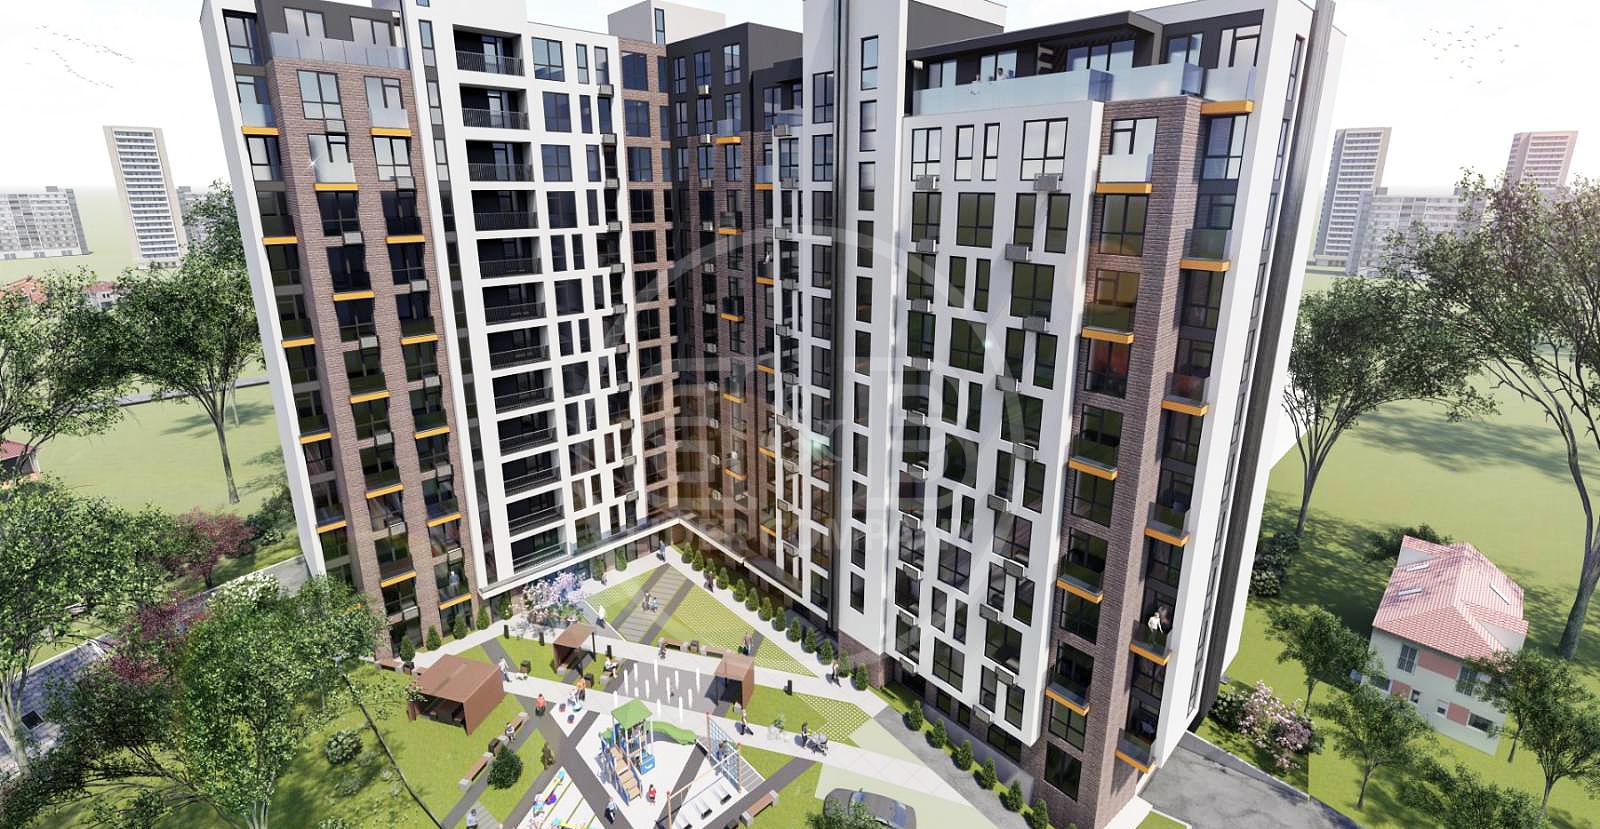 Vis-a-vis Circ apartament 2 camere separate variantă alba str. Andrei Doga